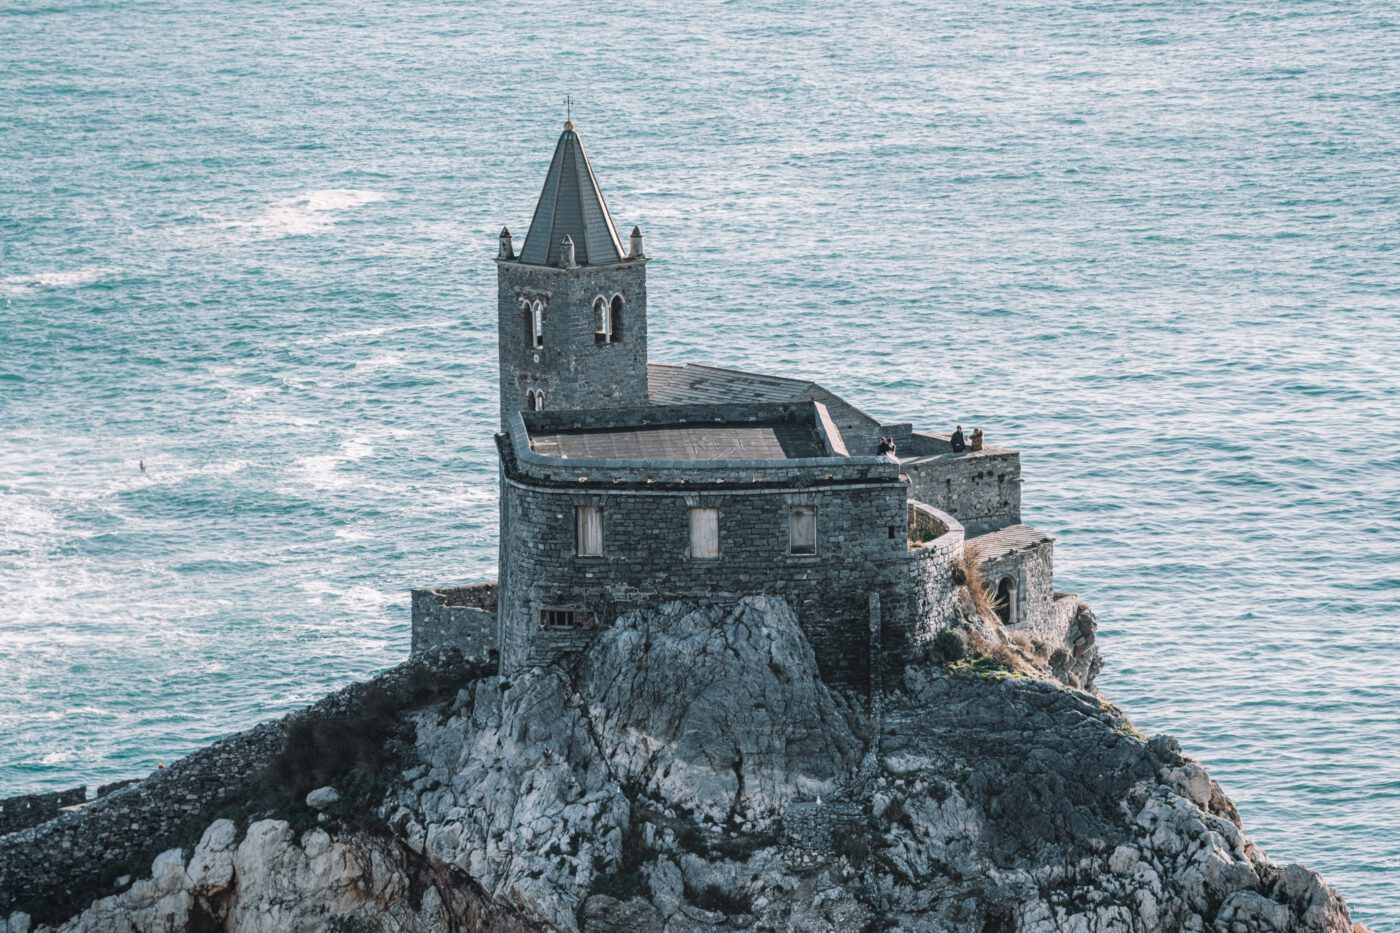 Liguria - Portovenere the ancient village of the poets